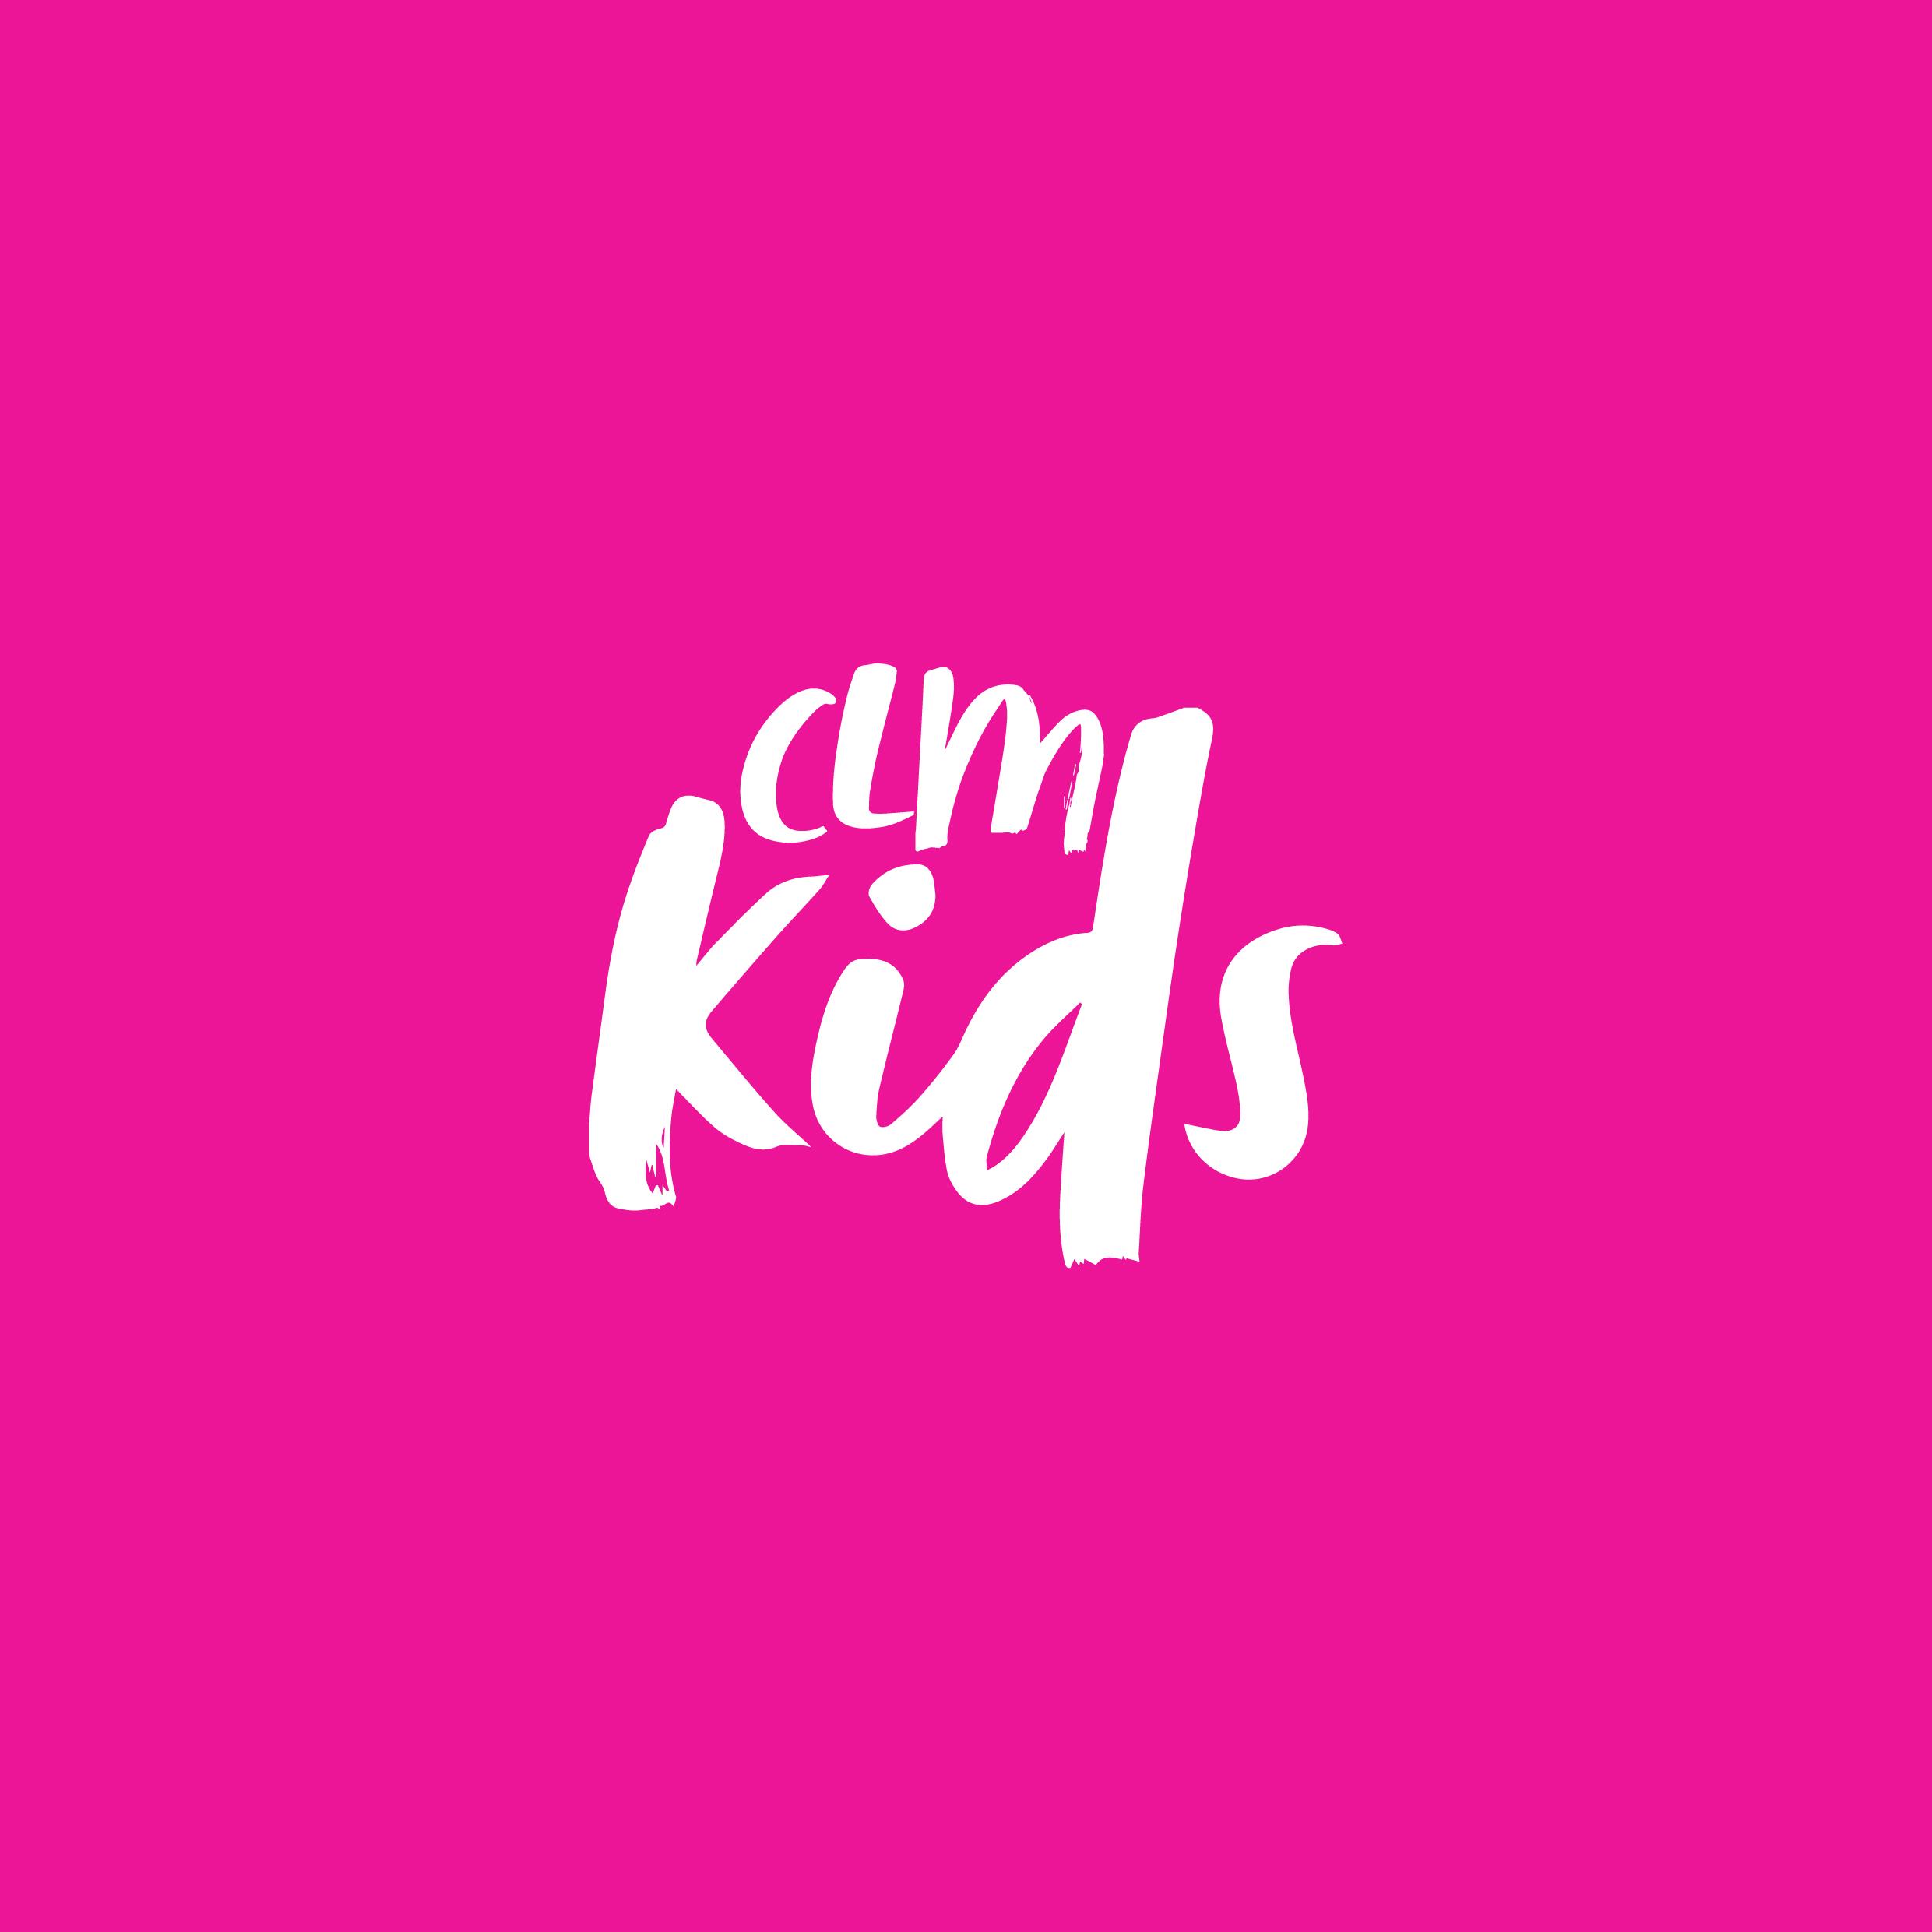 Clm-kids-logo-pink-01.jpg